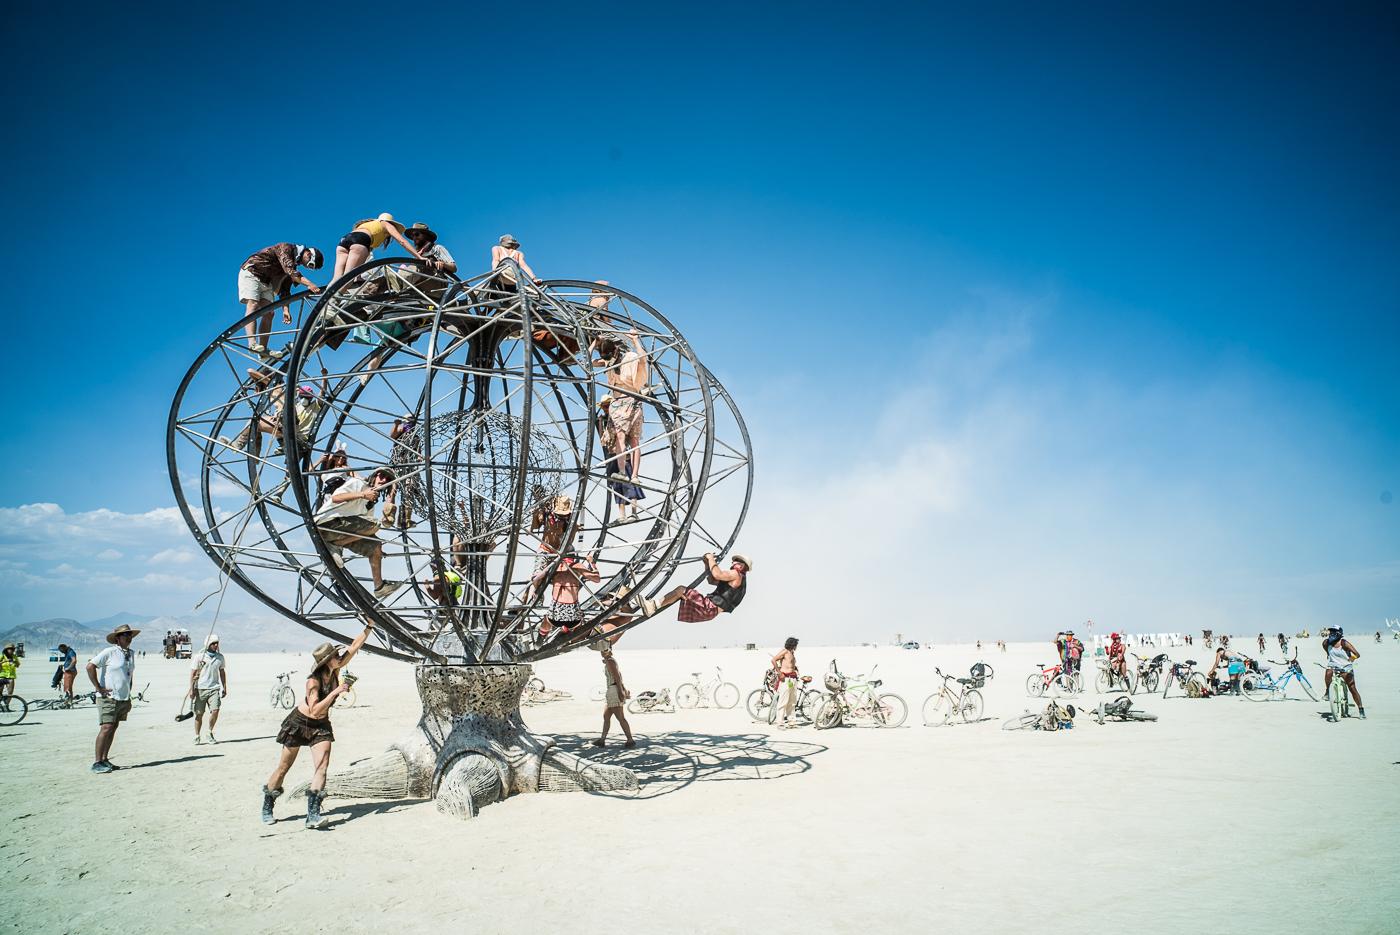 Dusty Art, Burning Man 2014: In Dust We Trust - Photos of a Dusty Playa